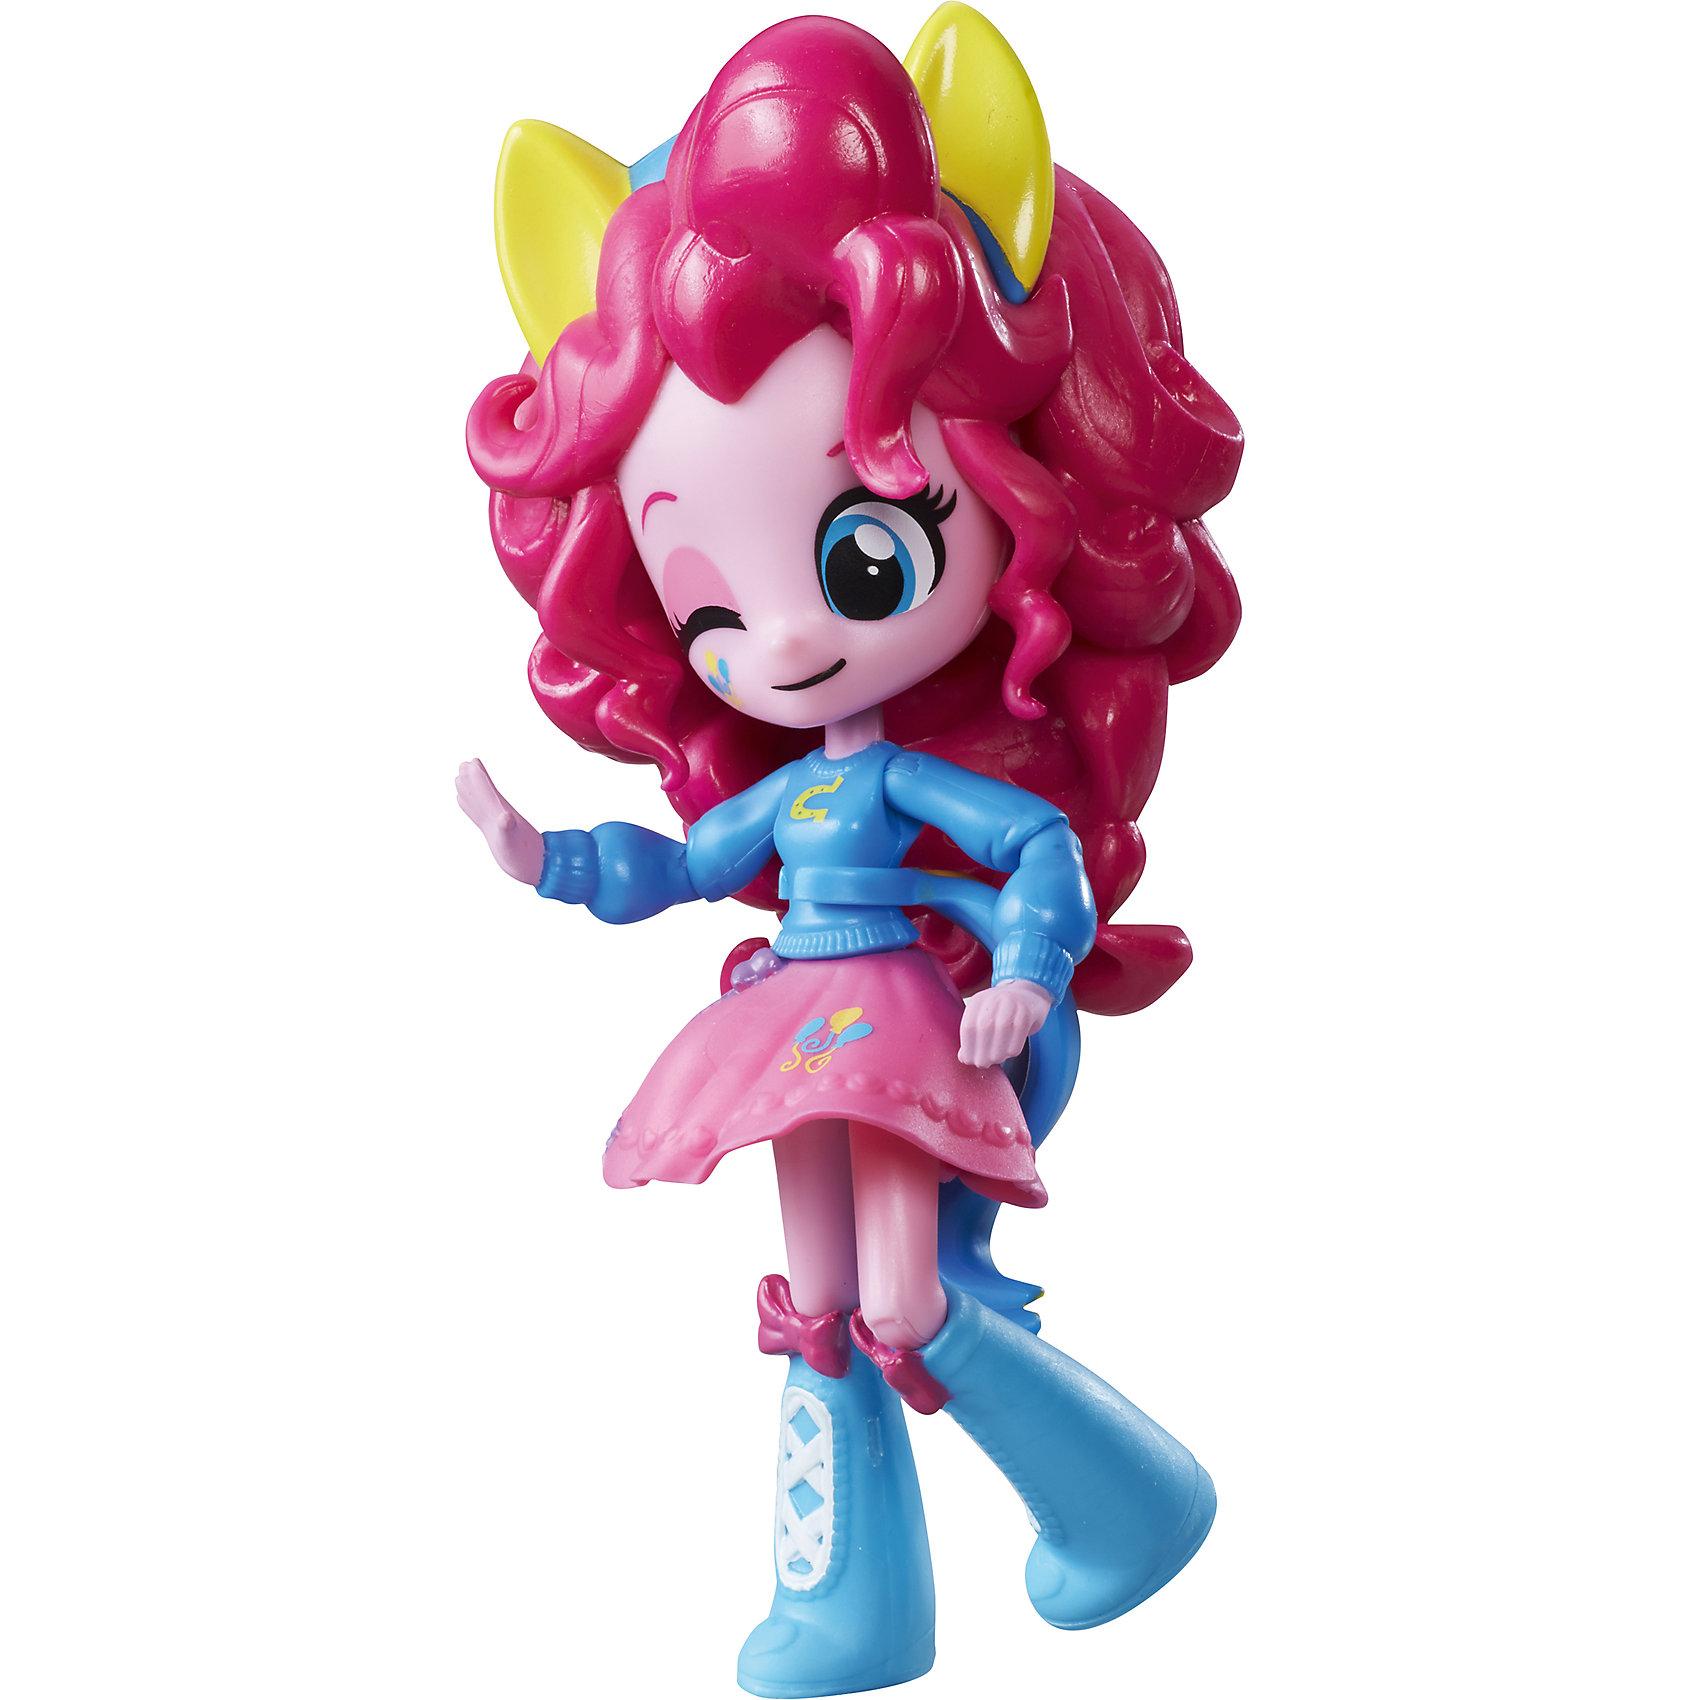 Hasbro Мини-кукла, Эквестрия герлз, B4903/B7793  hasbro мини кукла эквестрия герлз b4903 b7793